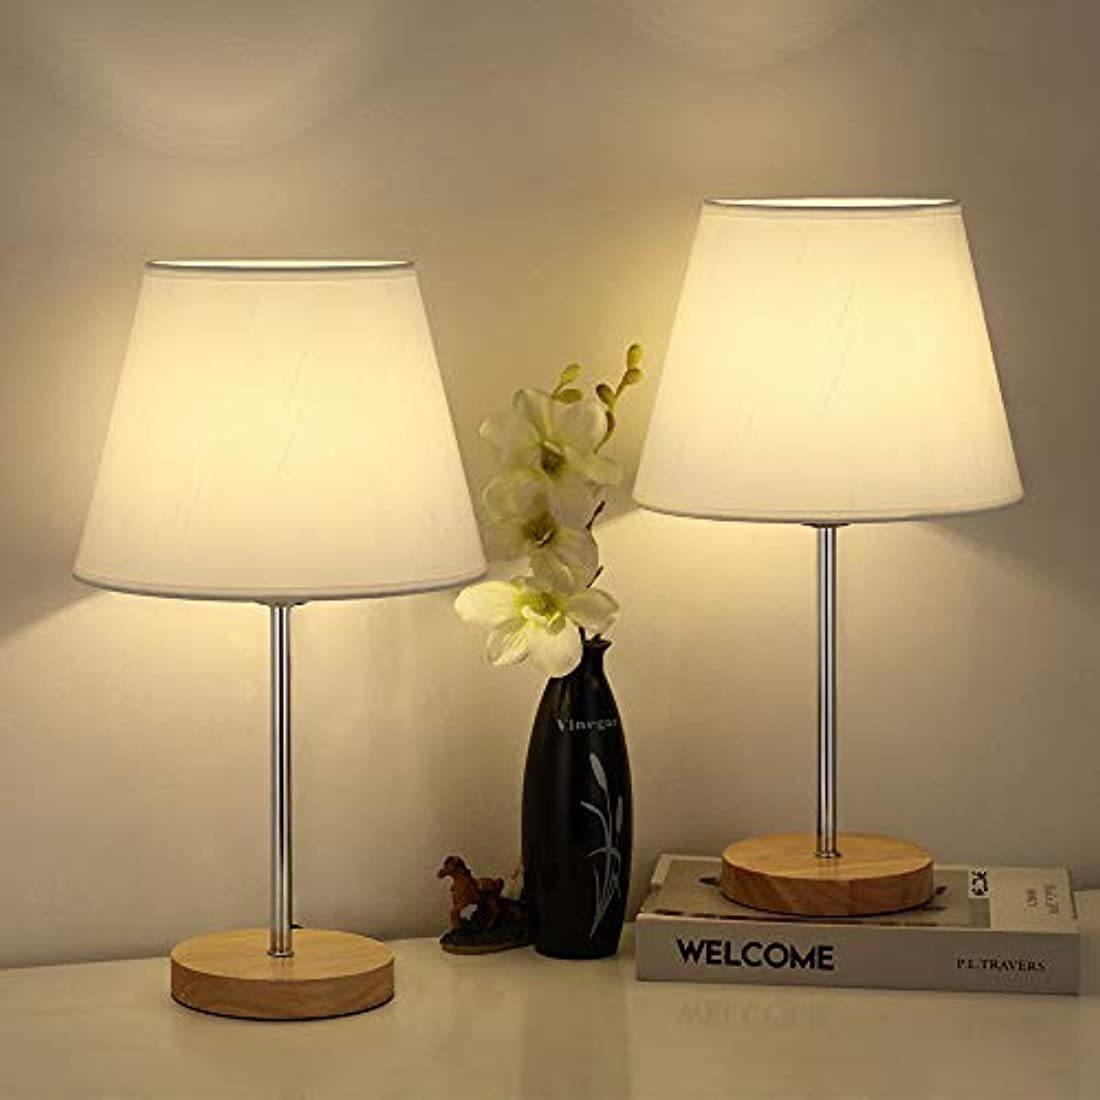 Picture of: Desk Lamp Nightstand Bedside Table Lamps Minimalist Light Se 274 900 En Mercado Libre